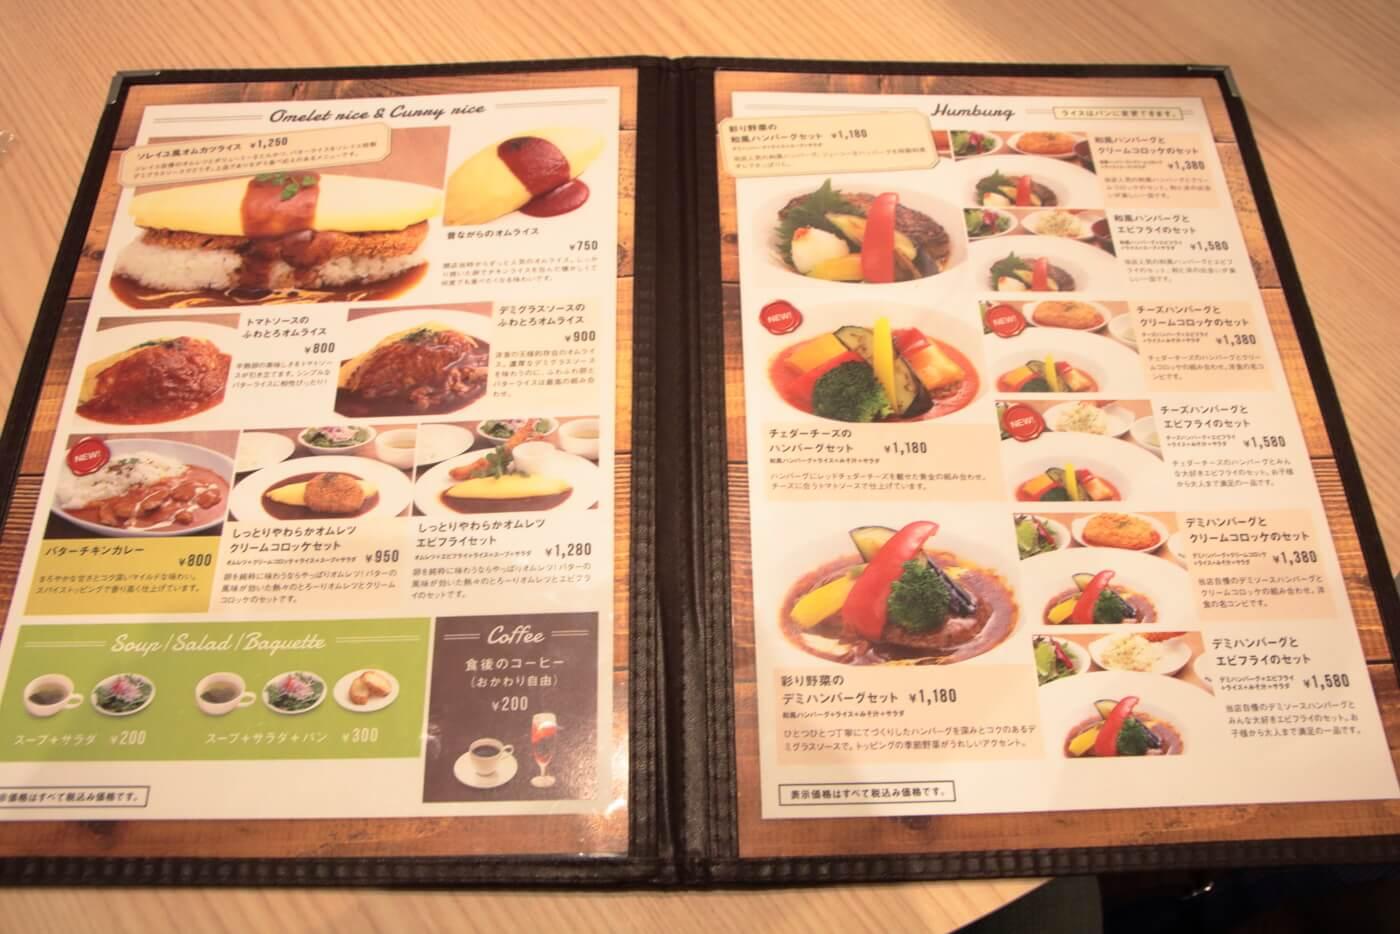 Cafe&Restaurant ソレイユのメニュー